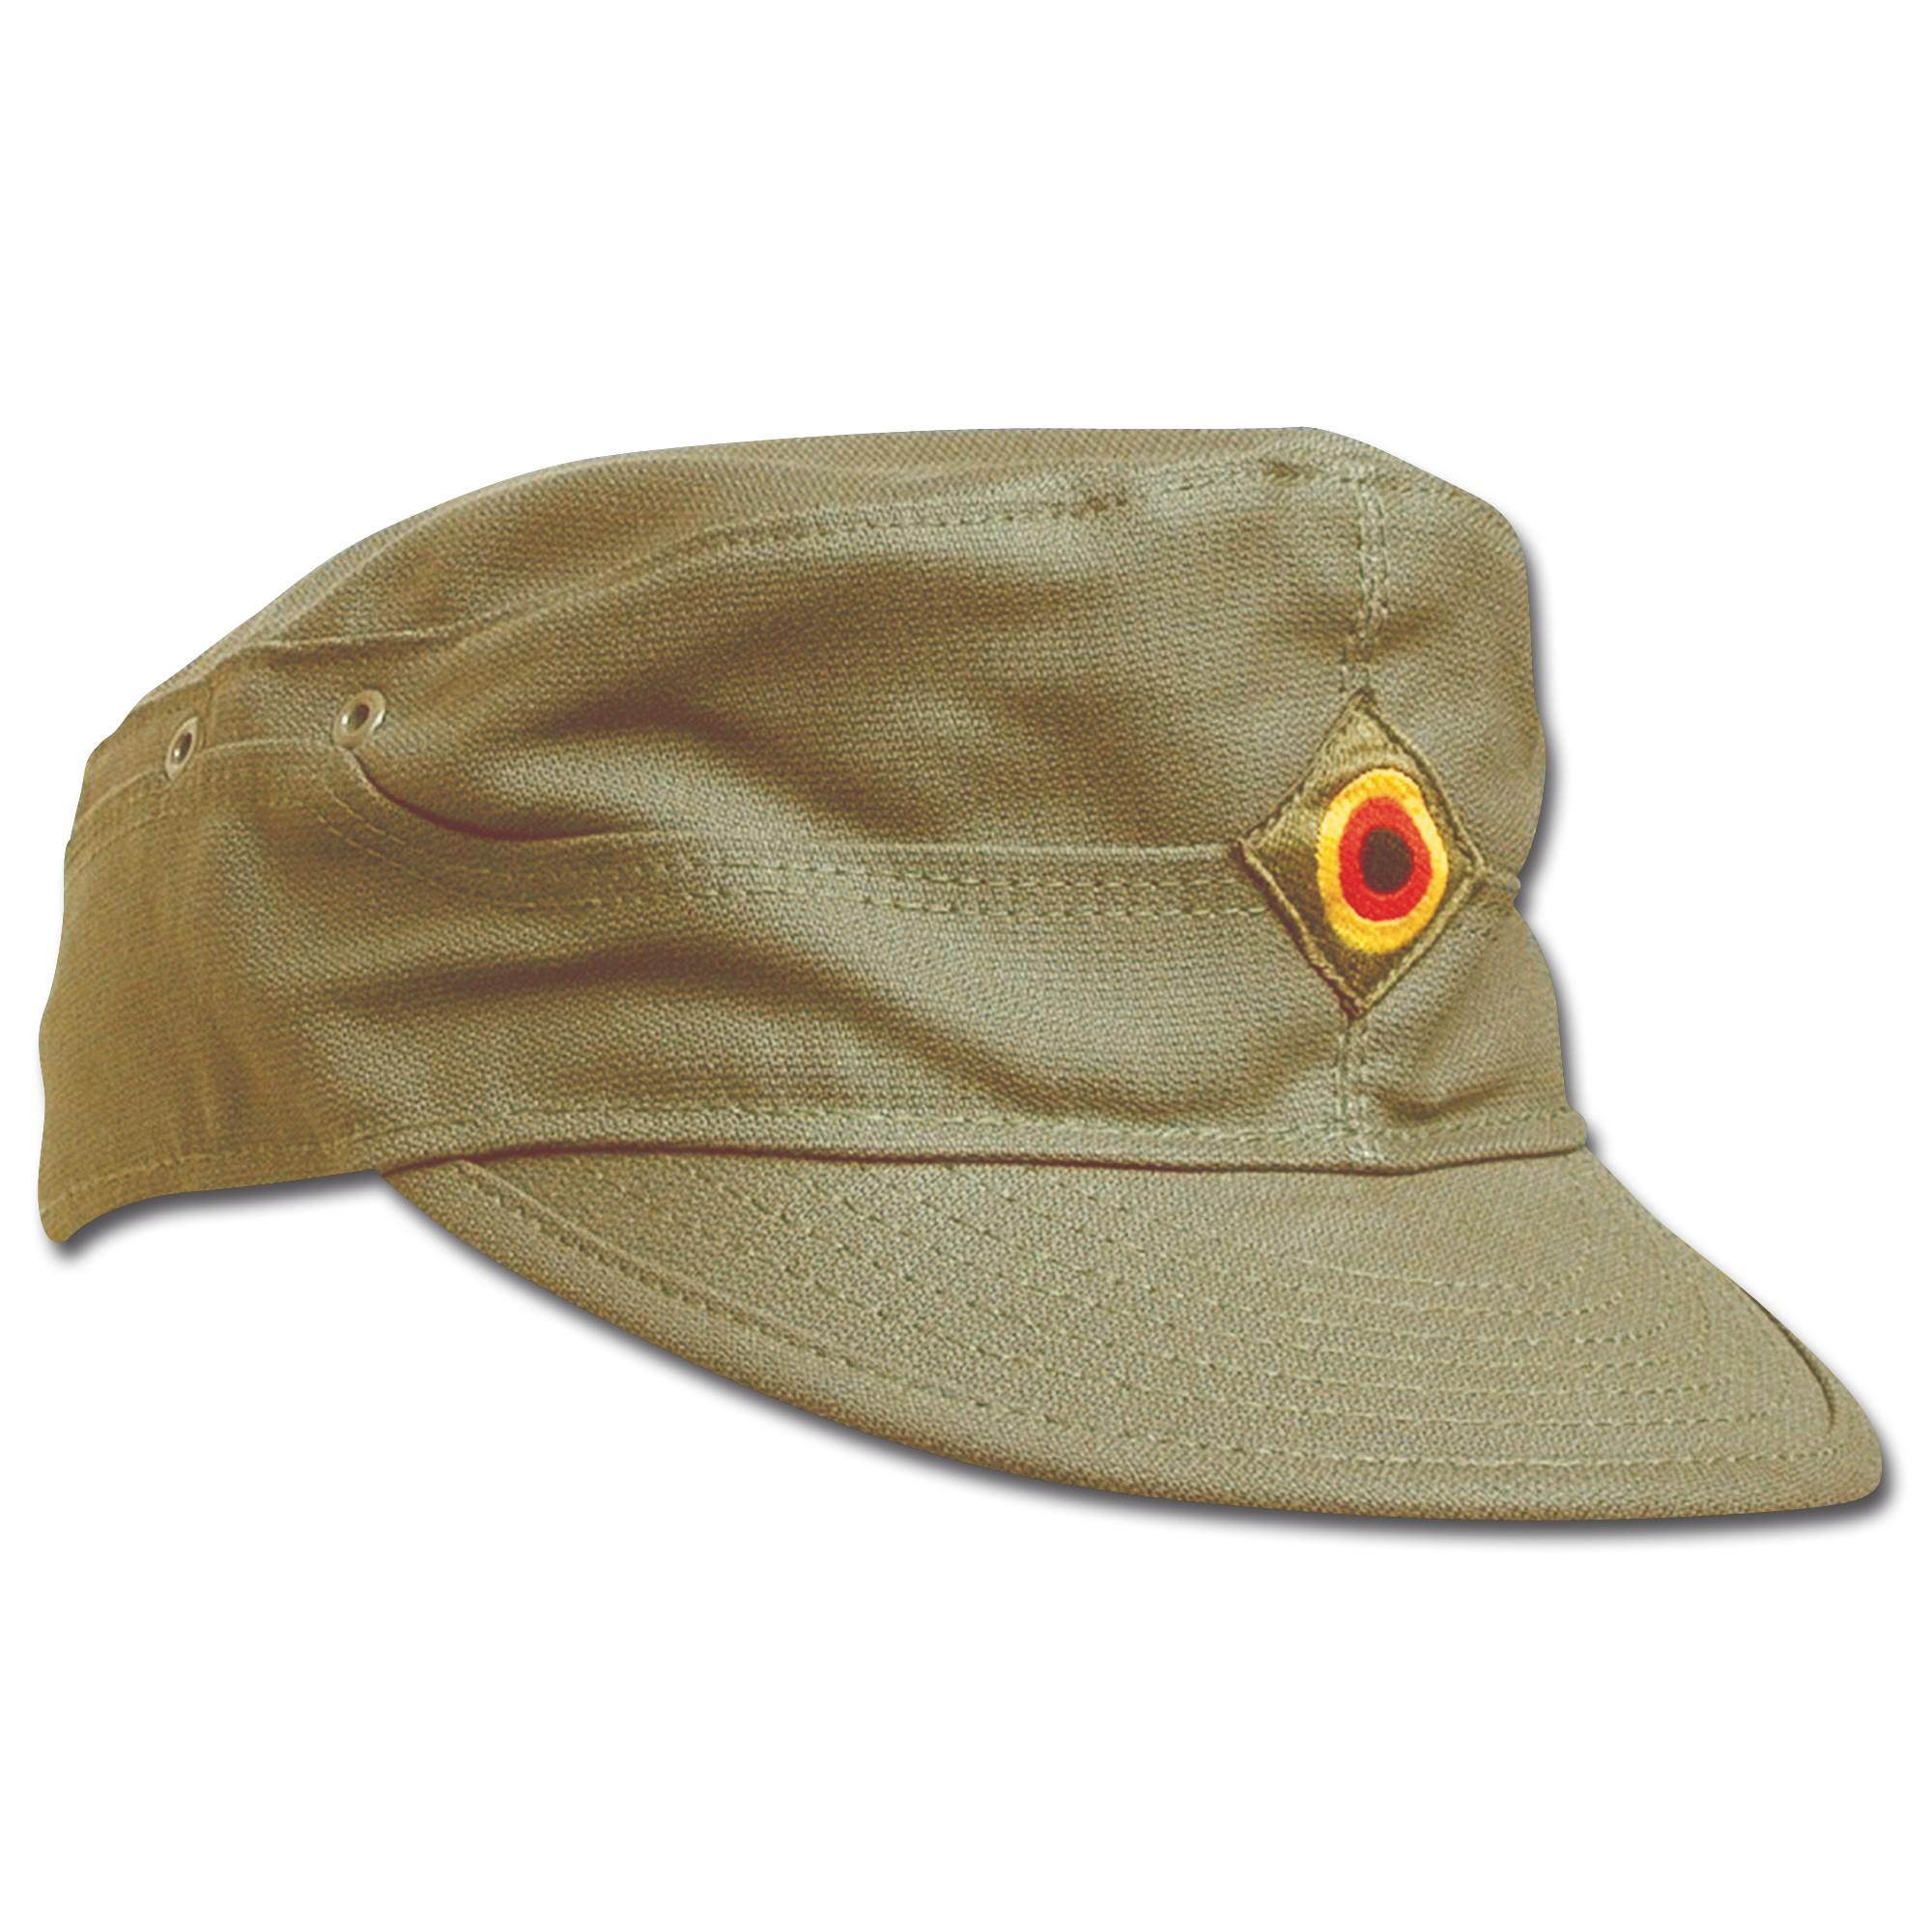 German Army Field Cap olive green